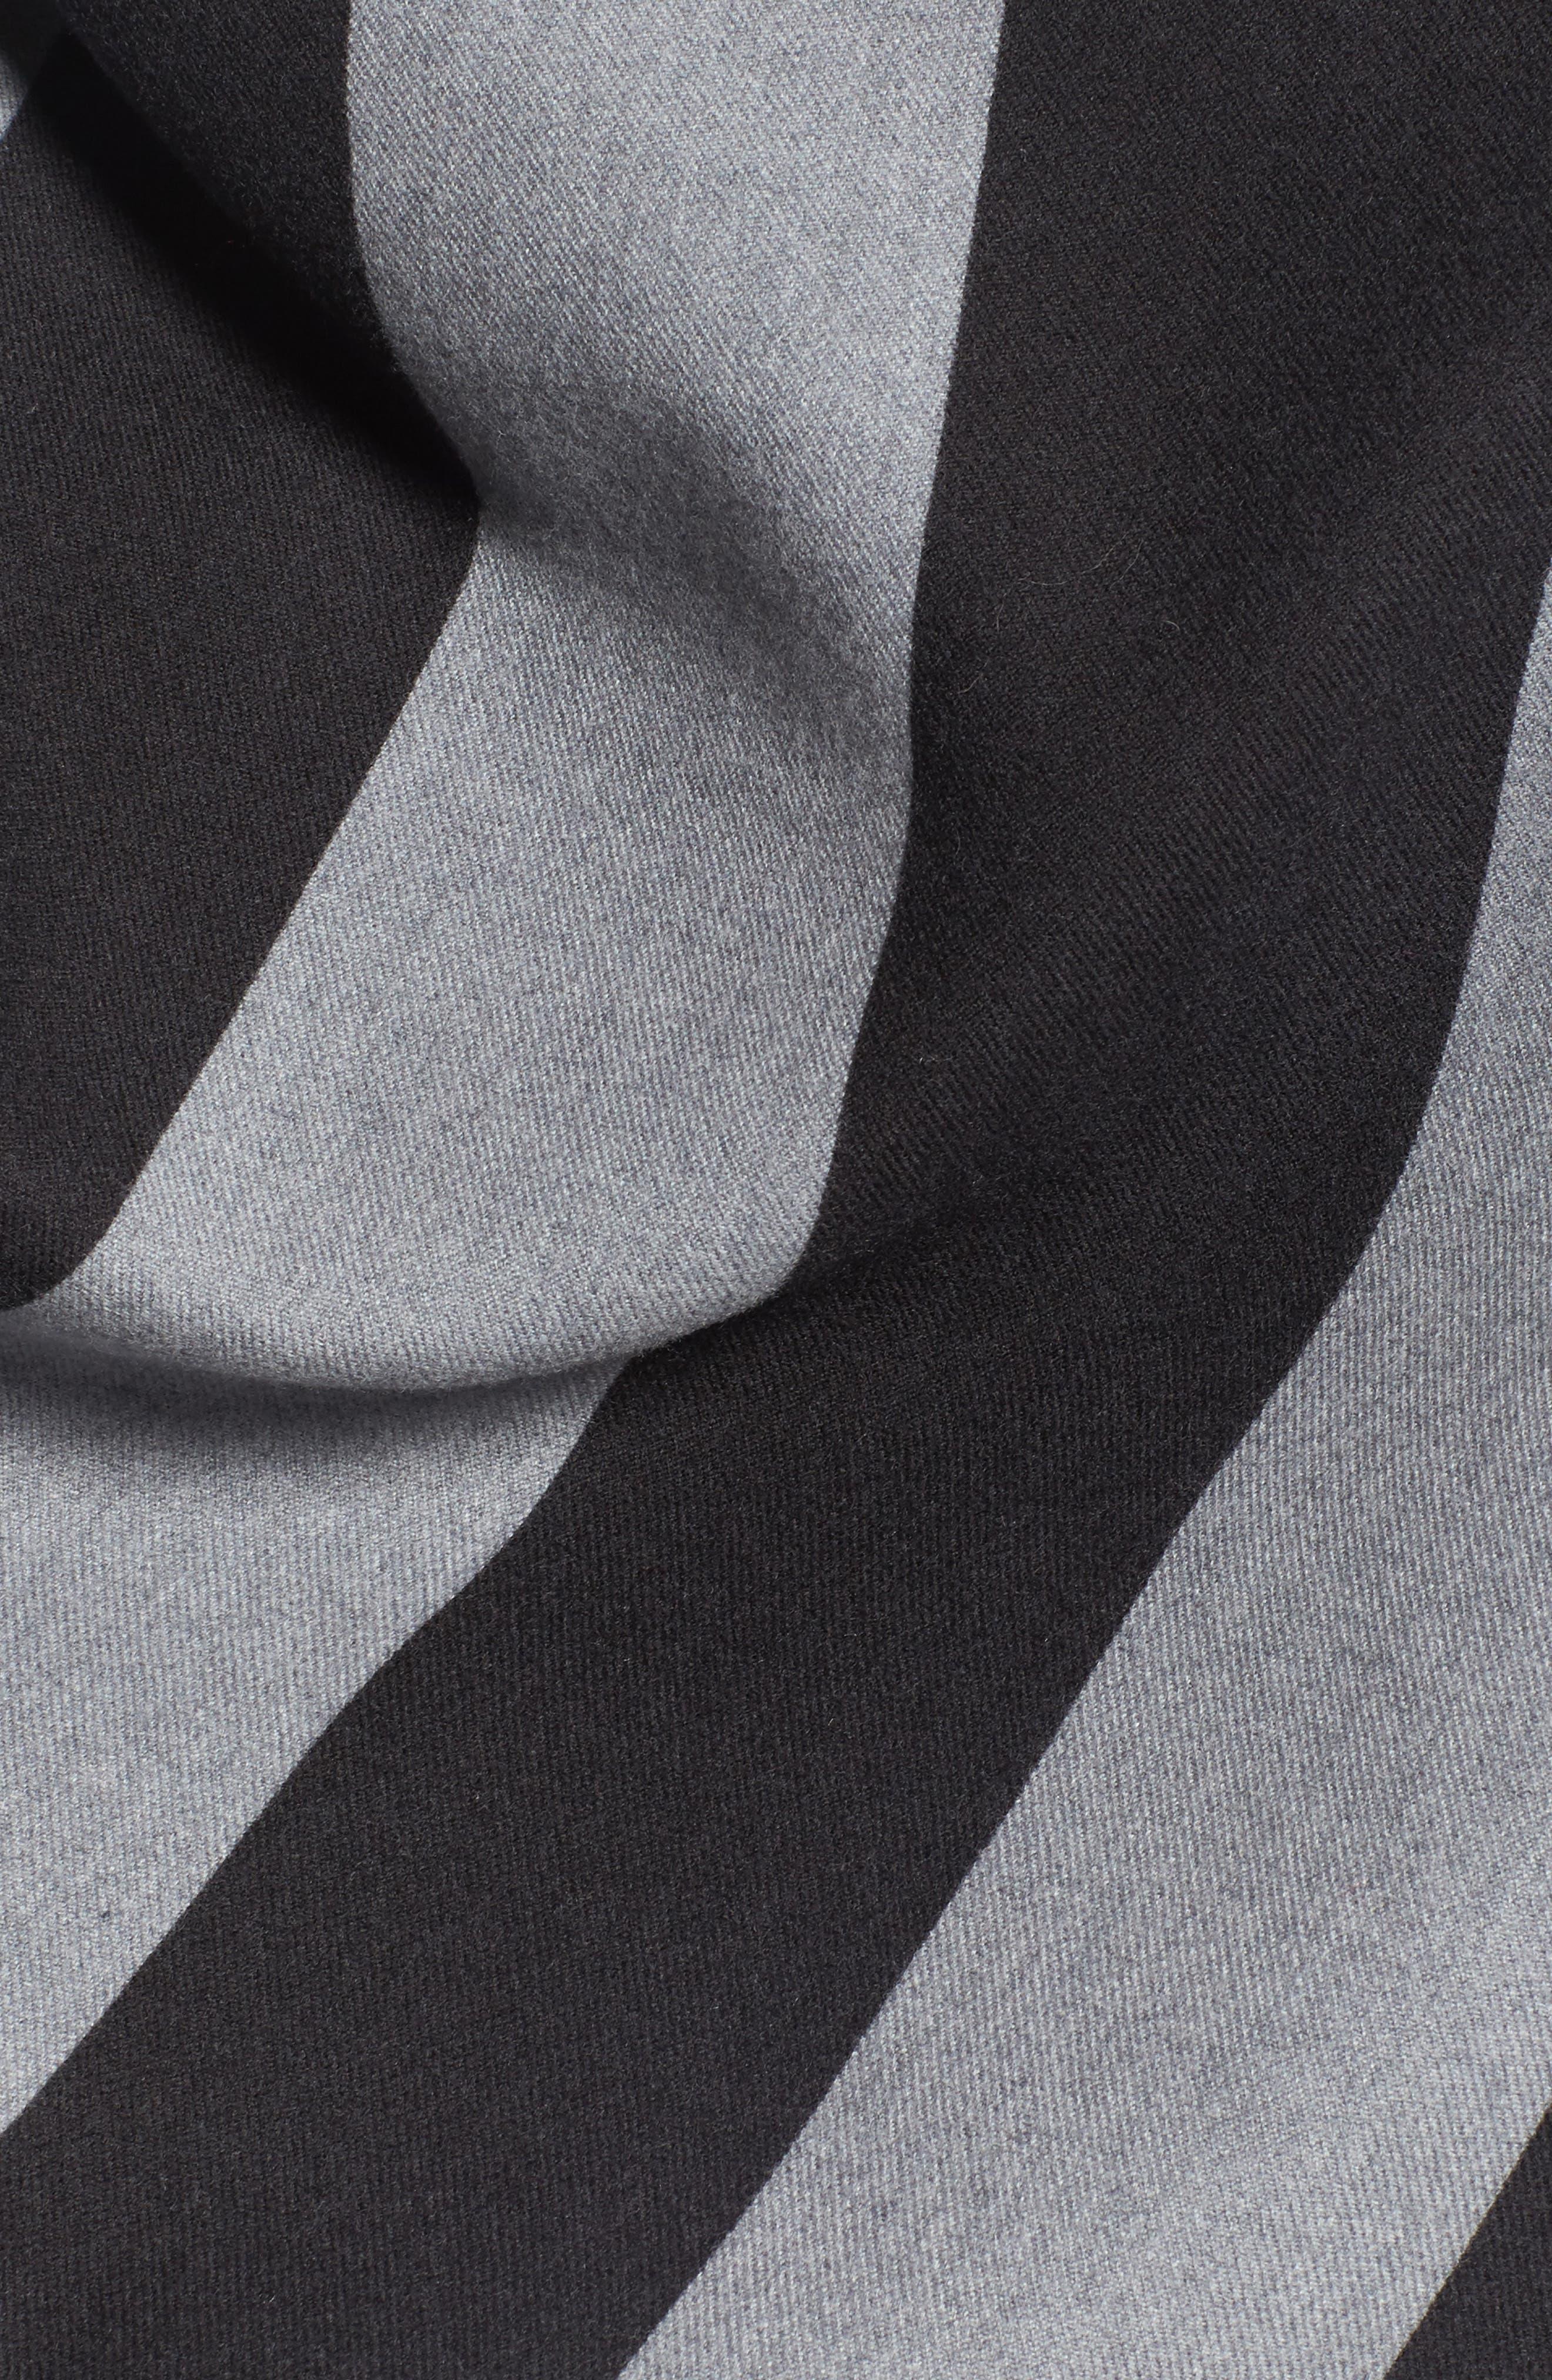 Stripe Merino Wool Poncho,                             Alternate thumbnail 5, color,                             020